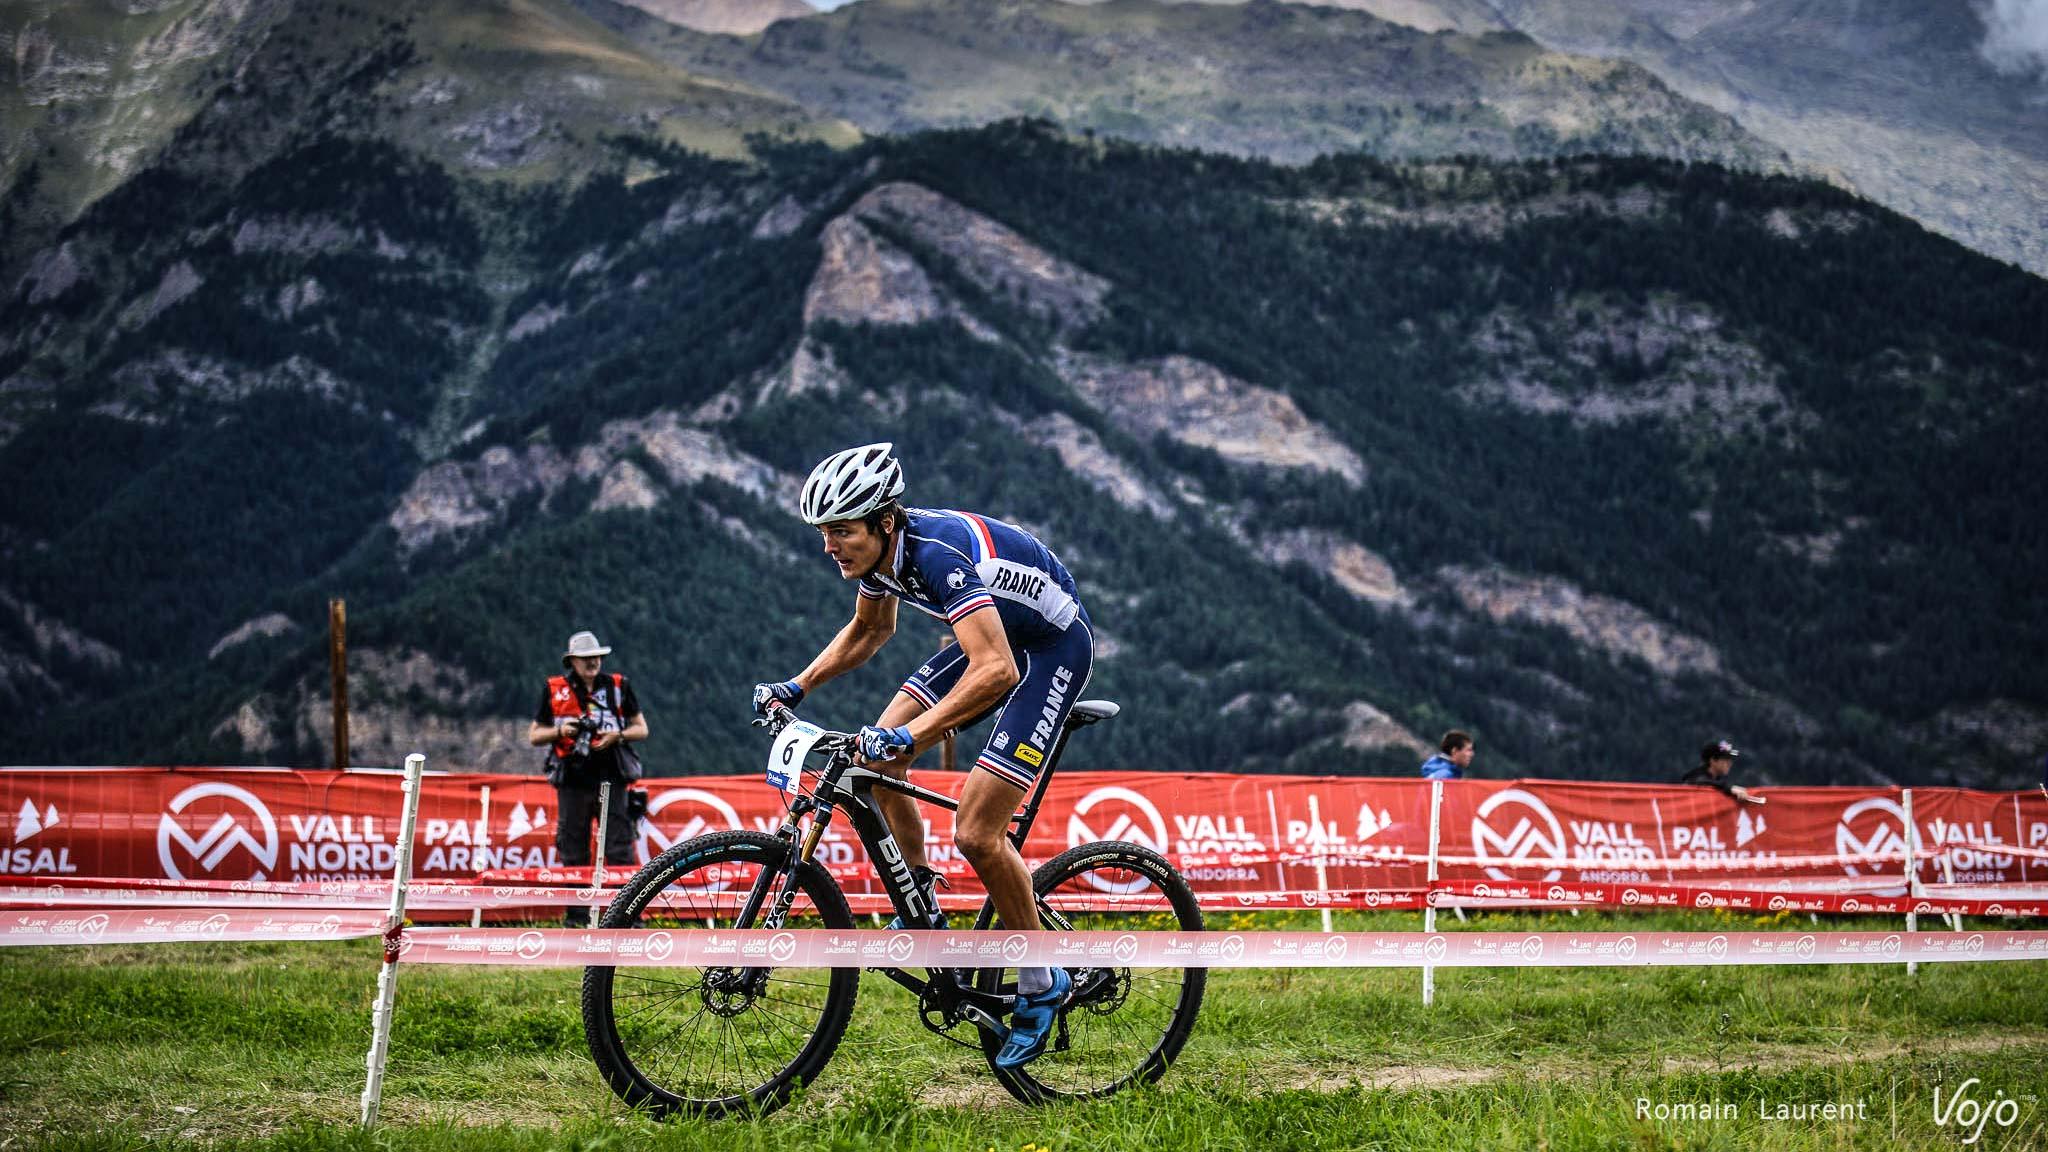 World_Championship_Andorra_Vallnord_XC_Eliminator_2015_Copyright_Romain_Laurent_VojoMag-26